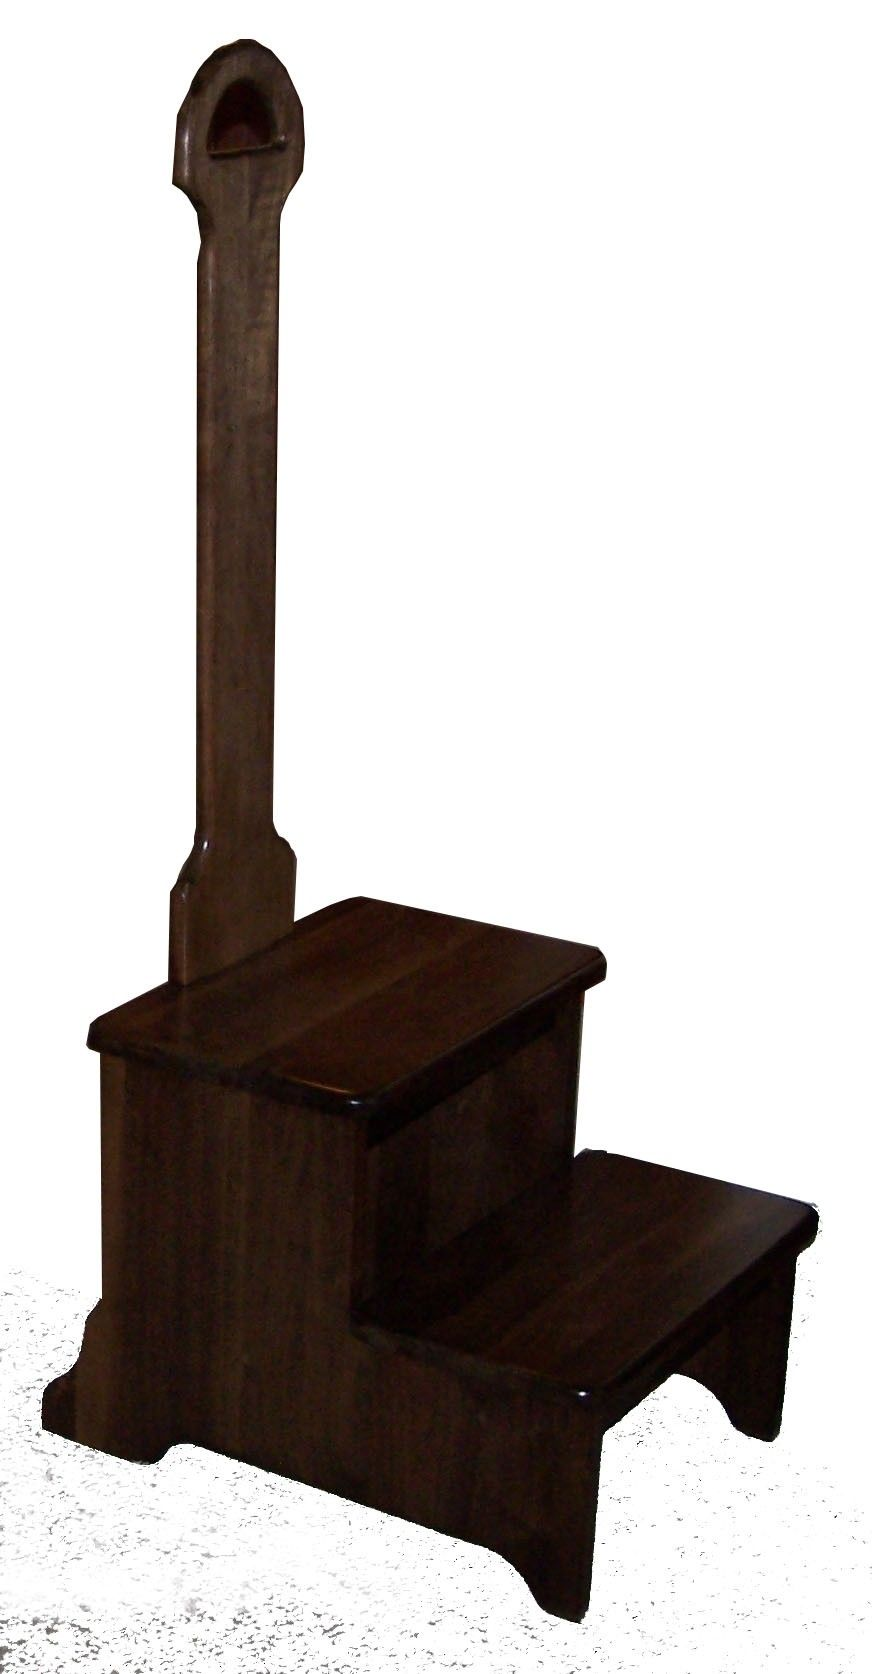 Mega 2 Step Step Stool With Handle Wood Step Stool Hand Crafted Furniture Step Stool